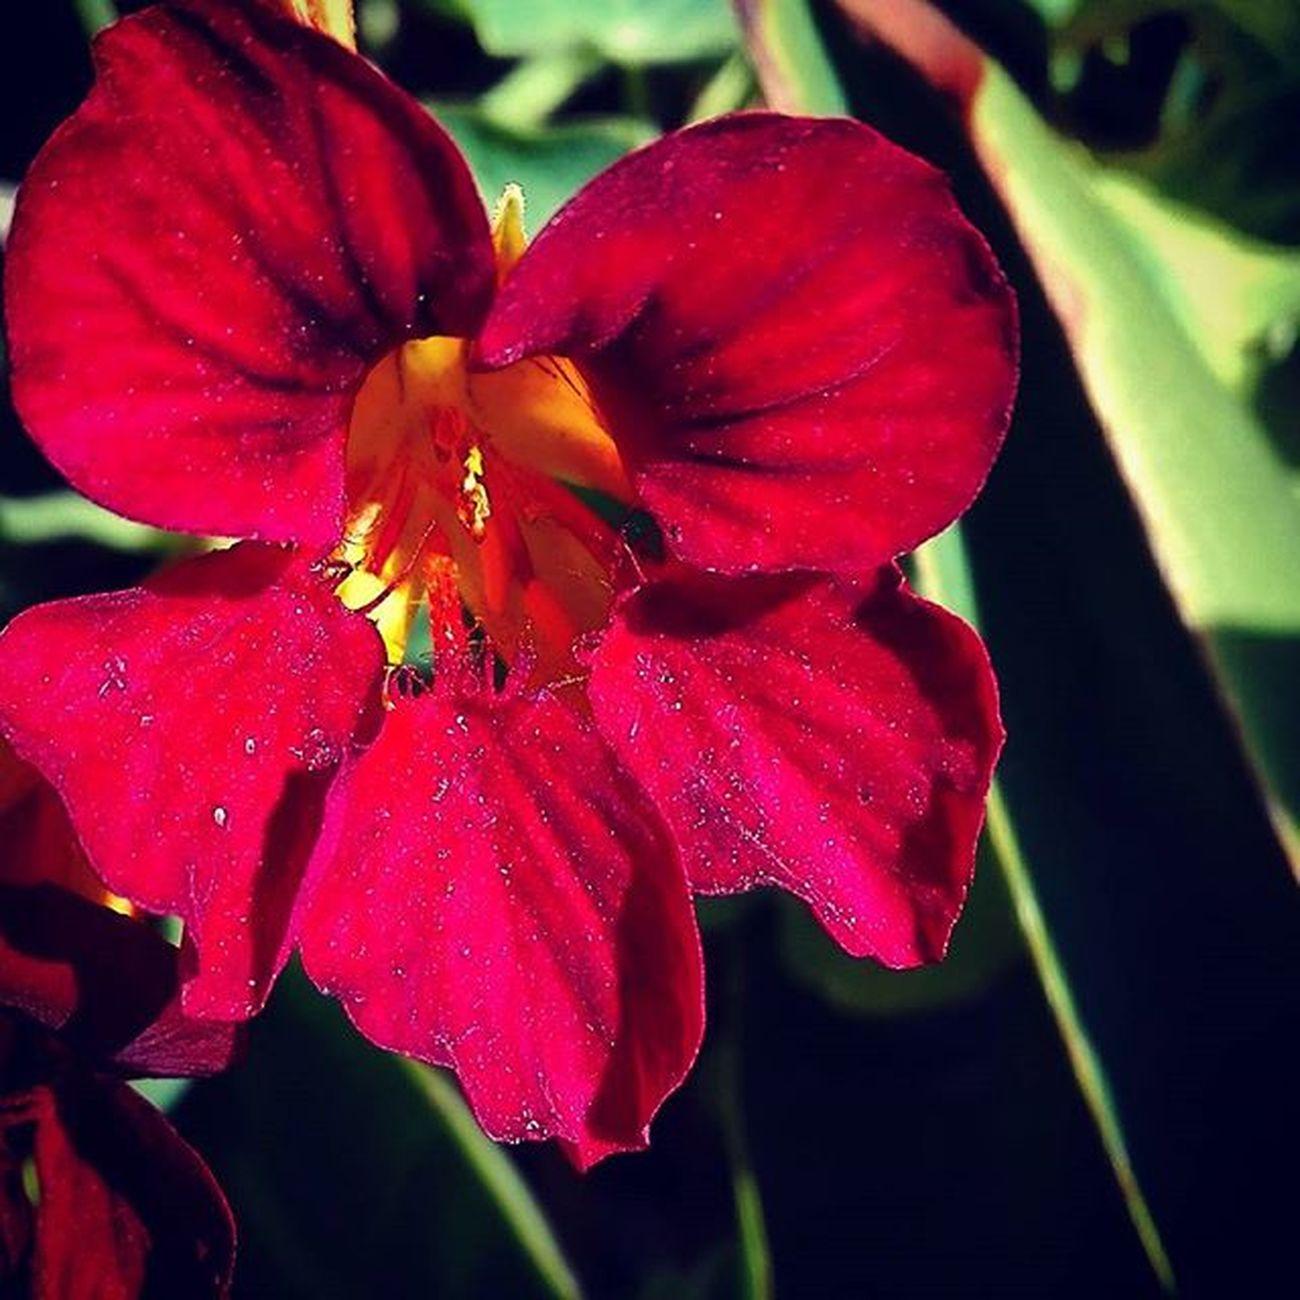 Af_floral➡🌼flowers Red Flower 9Vaga_ColorRed9 Nature Tt_wt_rflora Ptk_flowers_red1 Hello_red